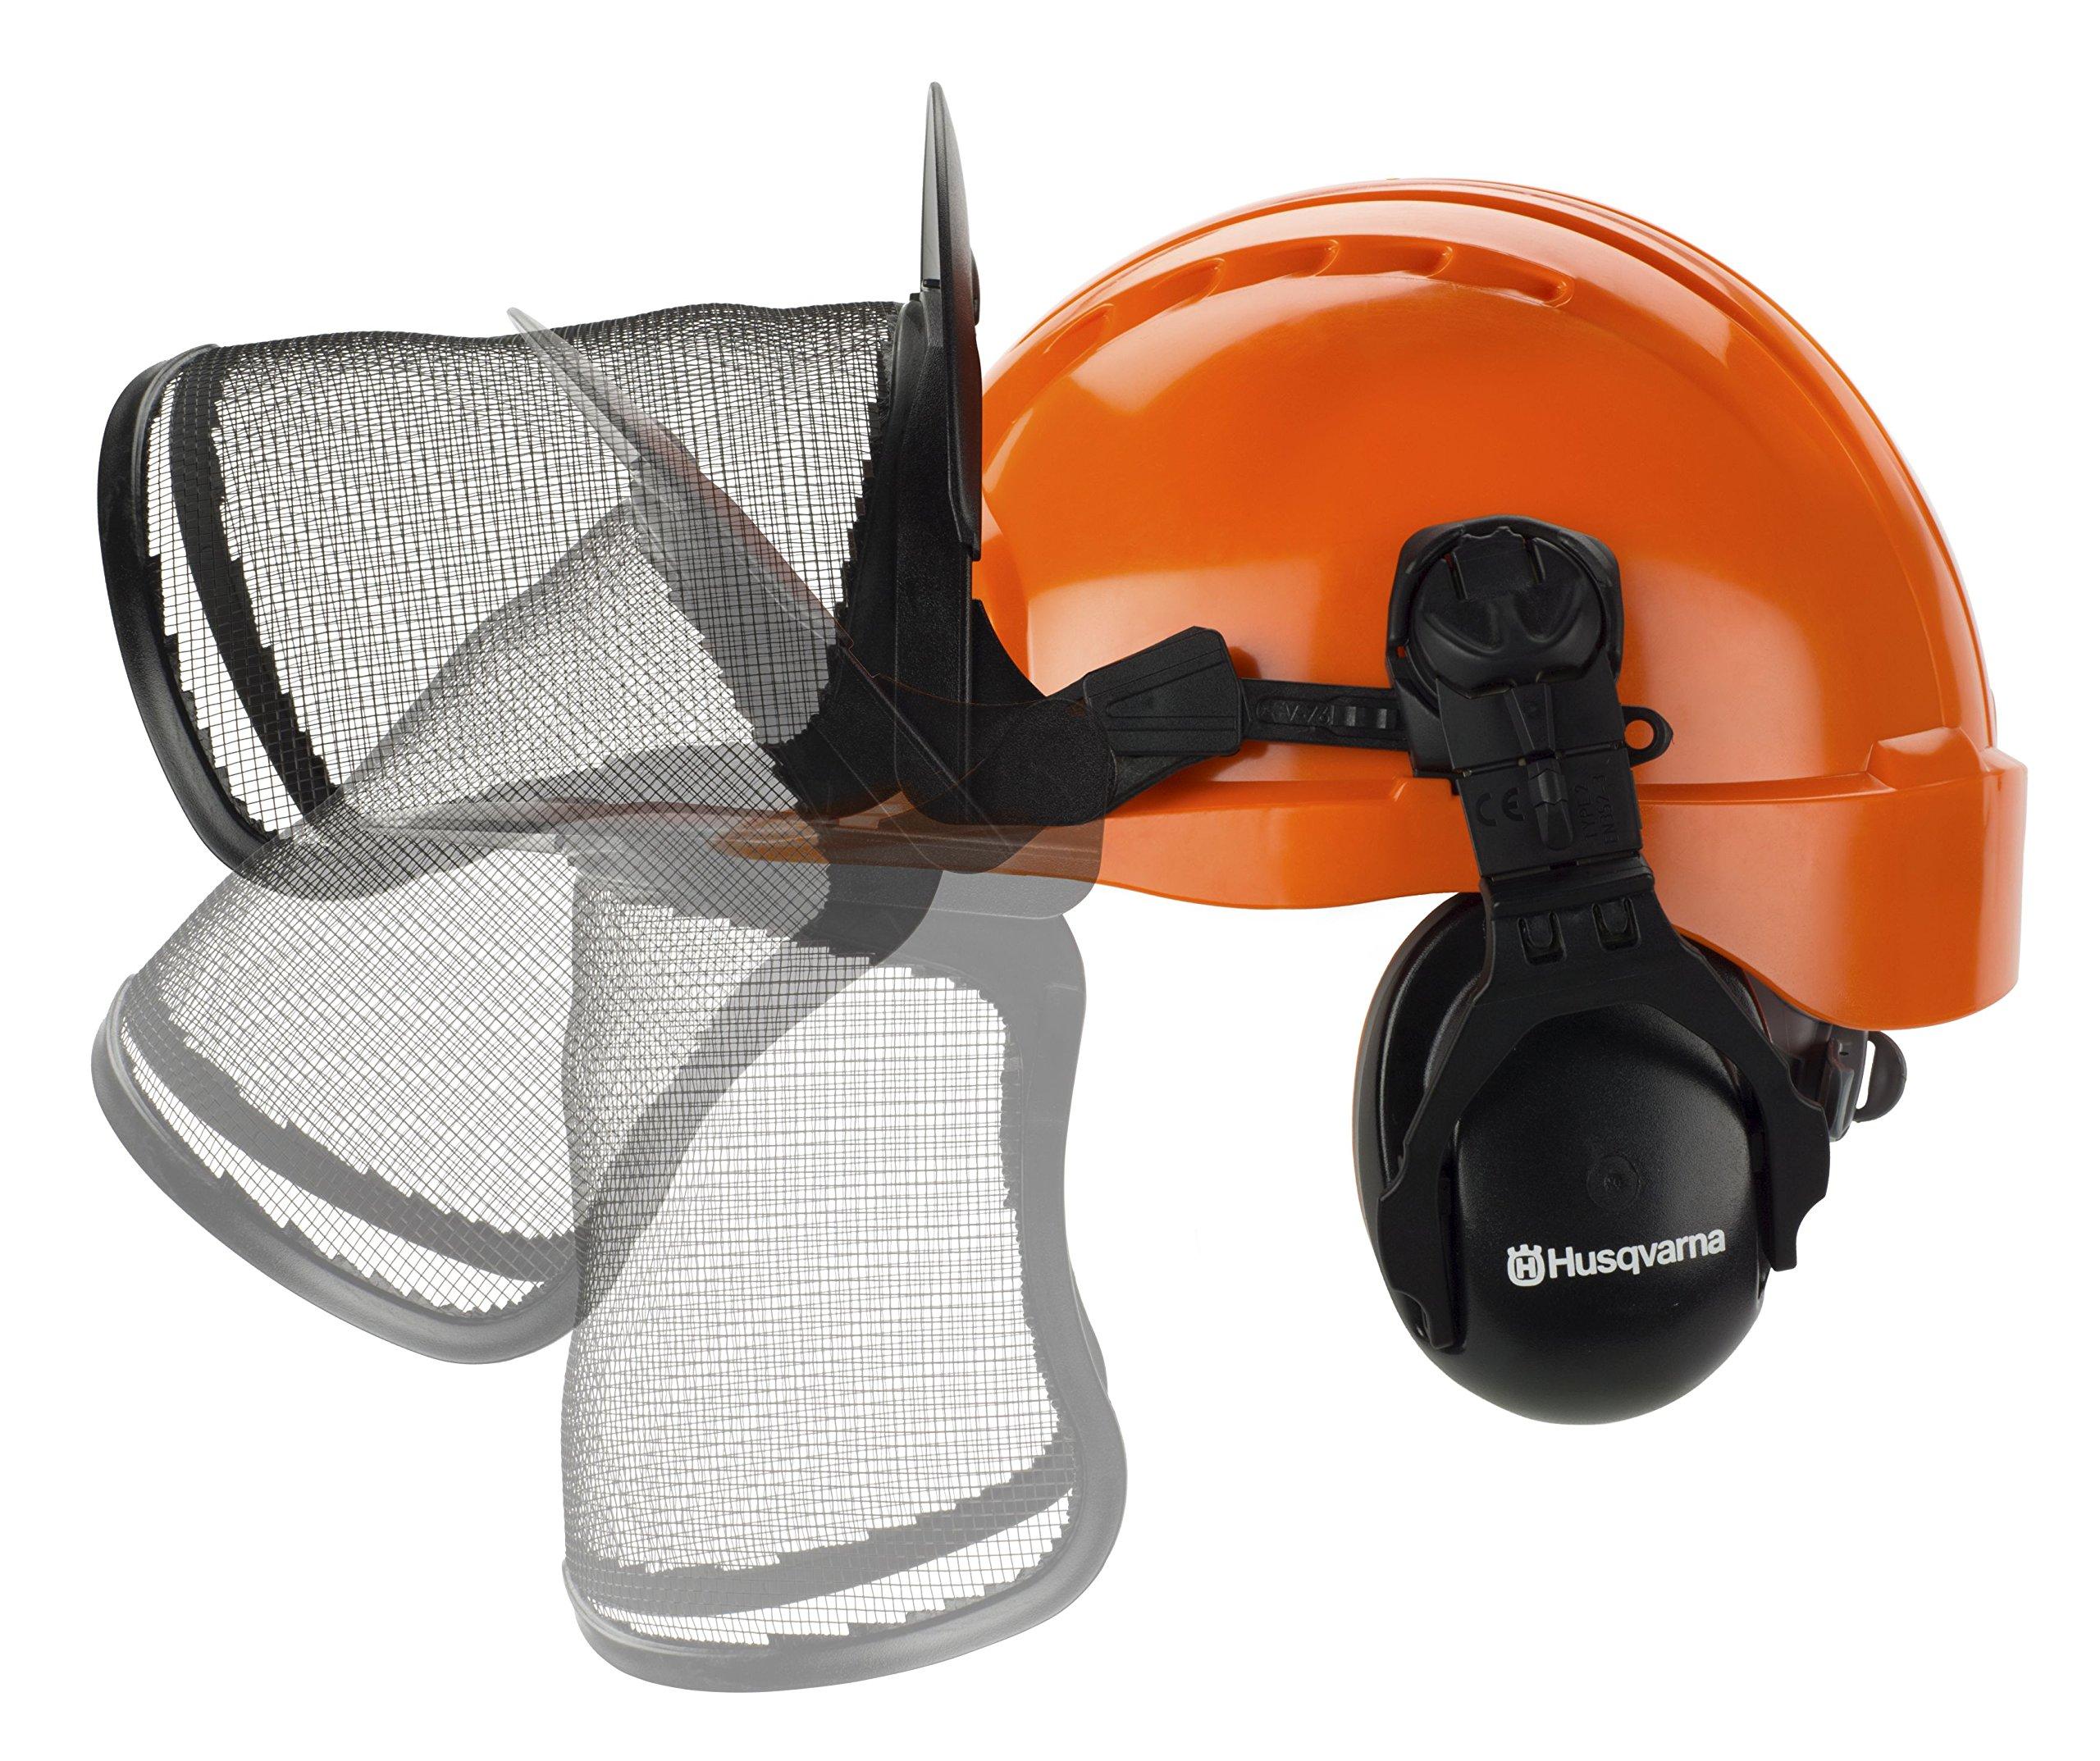 Husqvarna 592752601 Forest Head Protection Helmet by Husqvarna (Image #5)